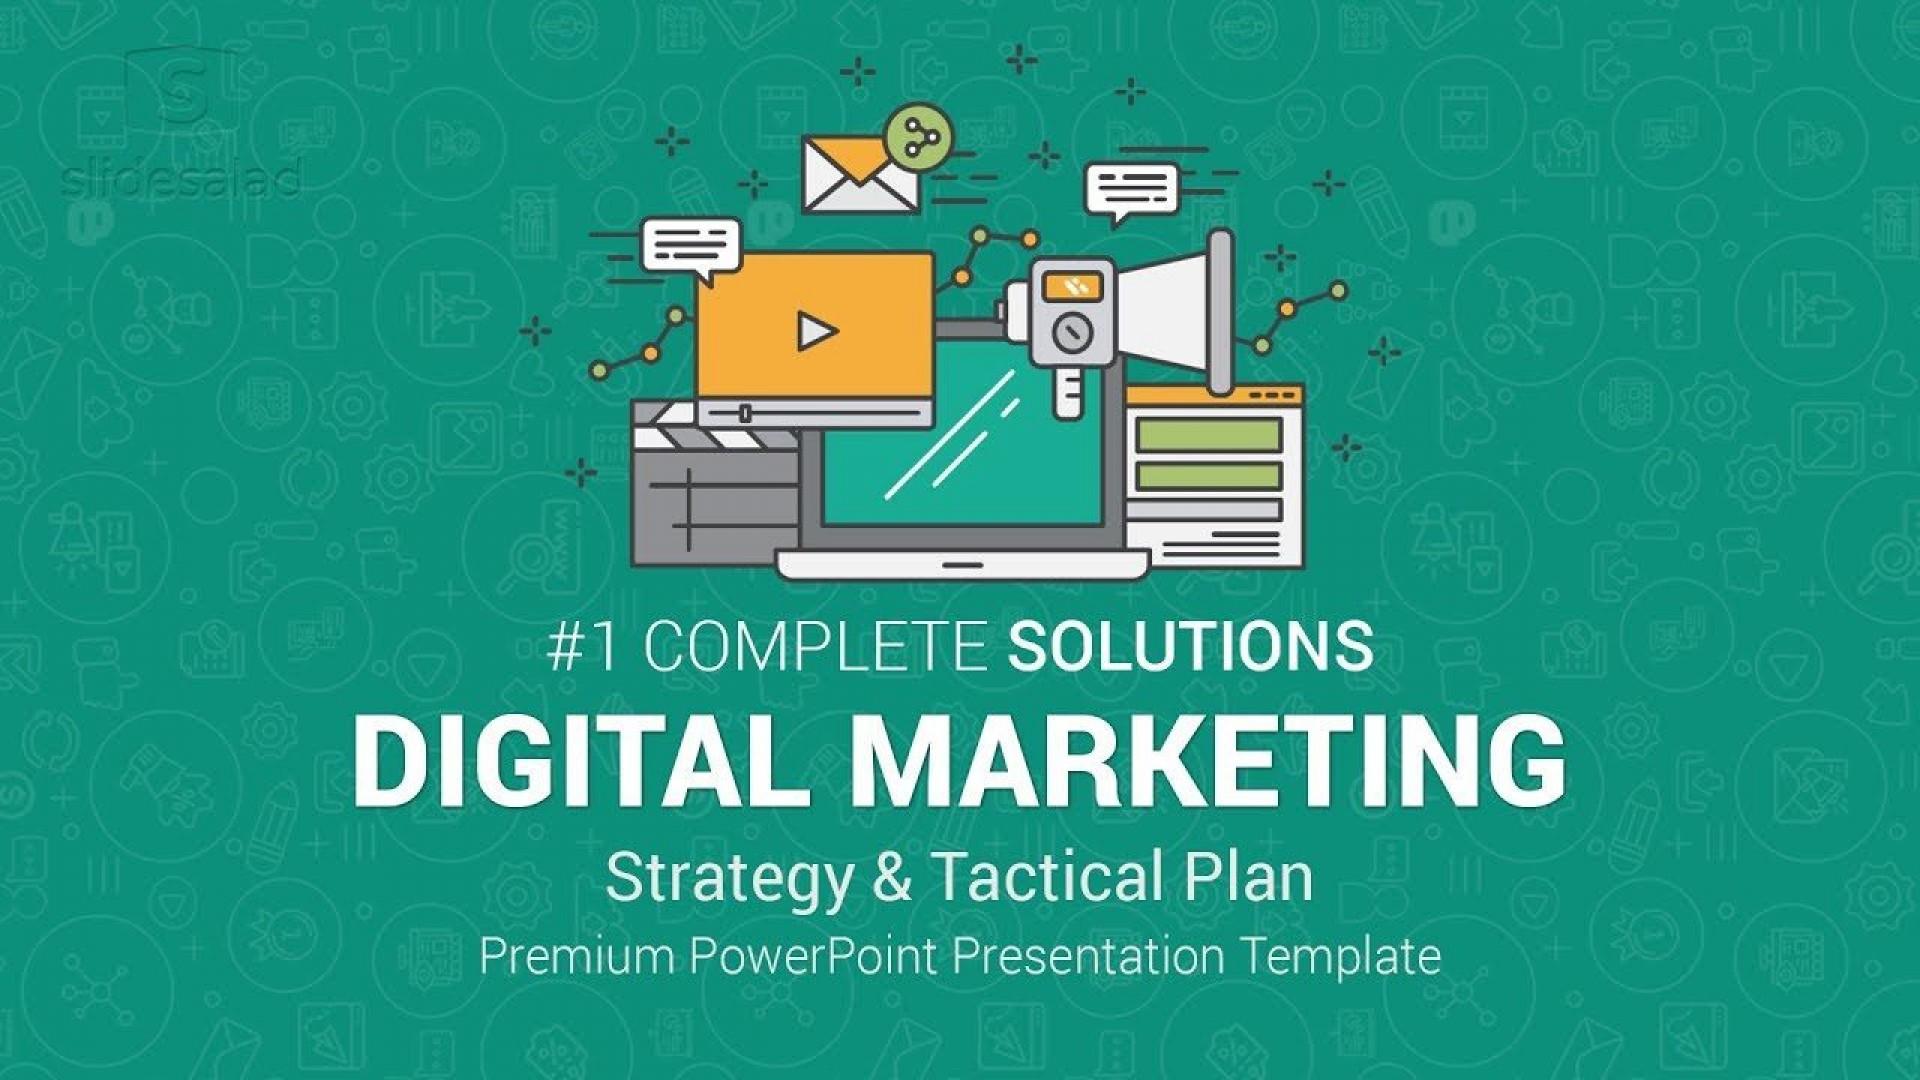 009 Outstanding Digital Marketing Plan Ppt Presentation High Definition 1920